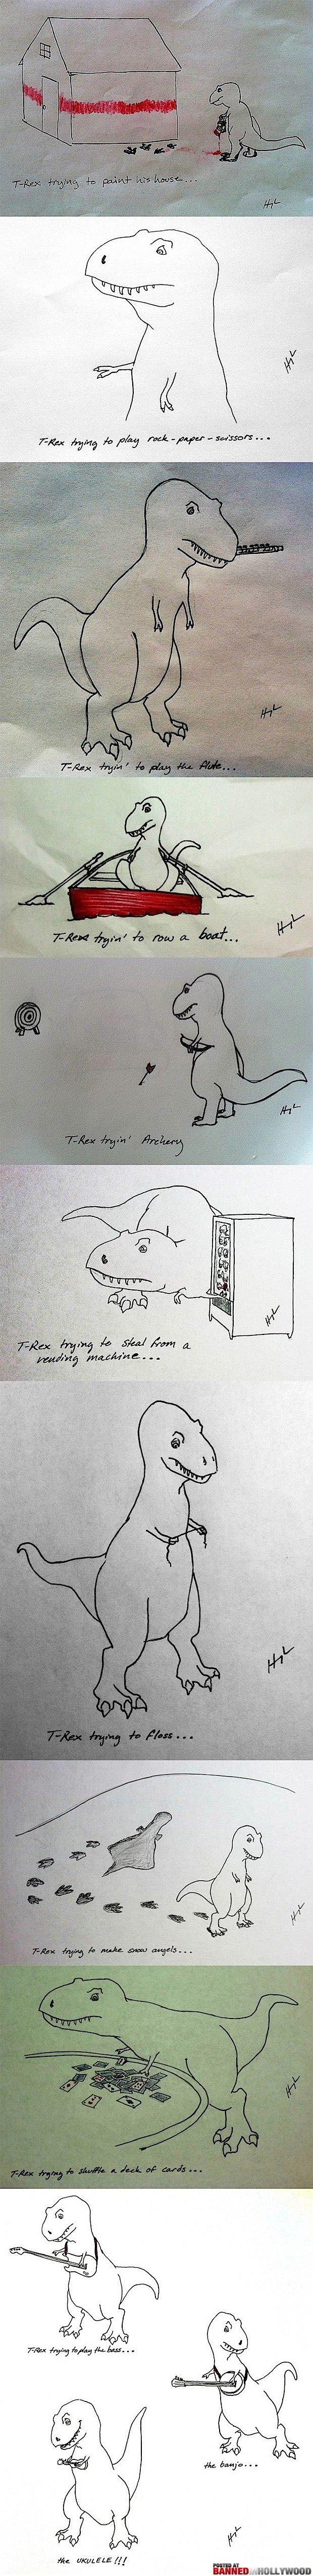 Sad Dinosaur Happy Dinosaur. .. What a heartwarming ending to a tragic tale Sad Dinosaur Happy What a heartwarming ending to tragic tale